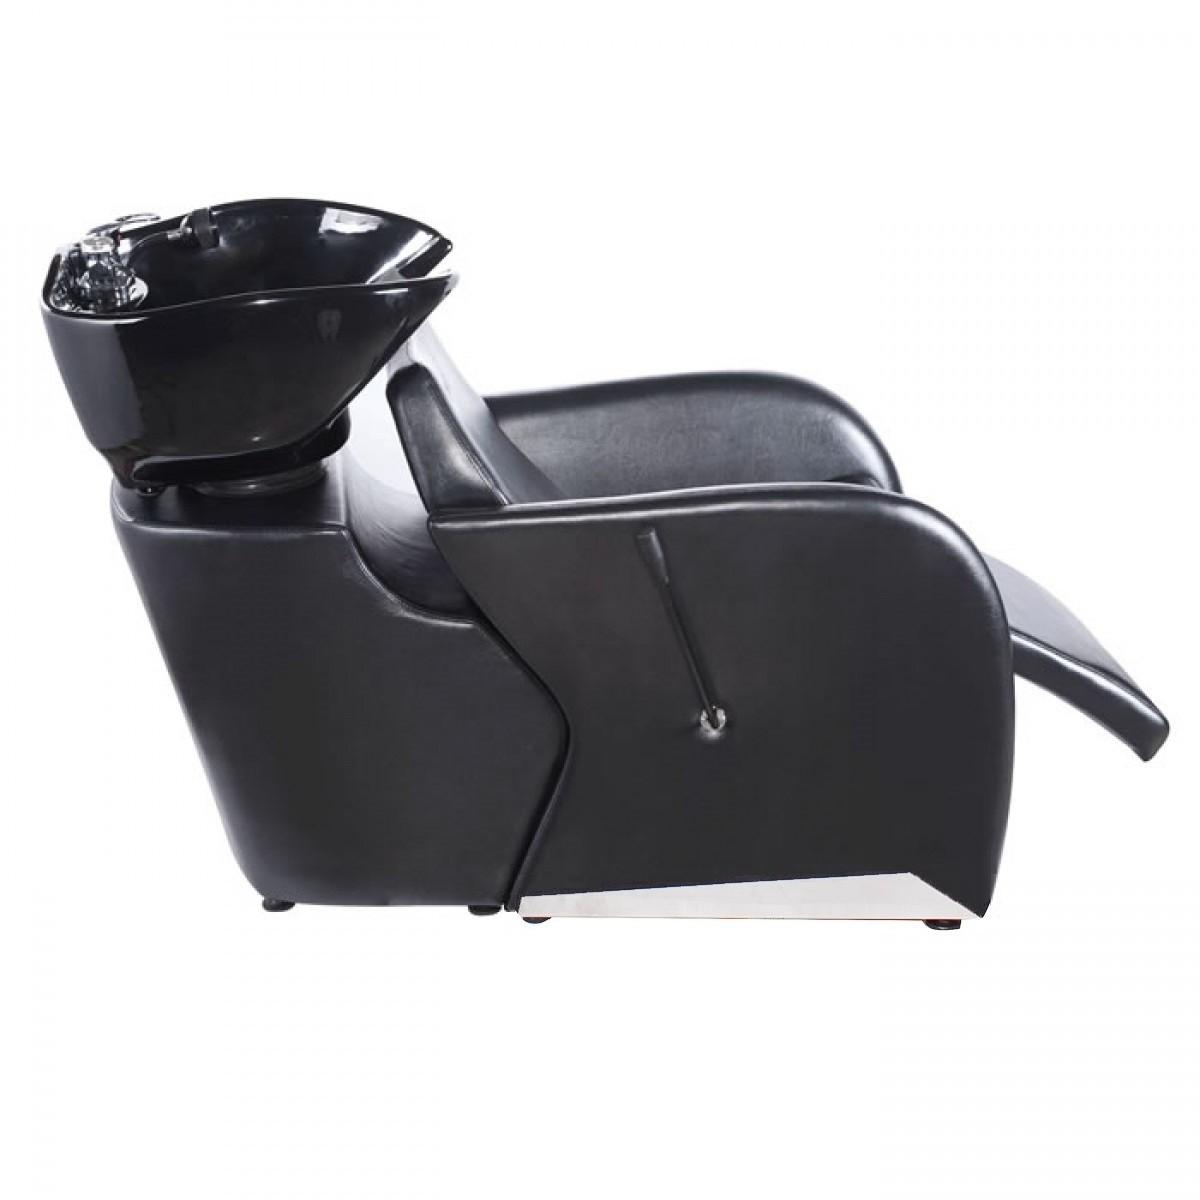 """VALENCIA"" Backwash Shampoo Sink, Backwash Shampoo Chair"